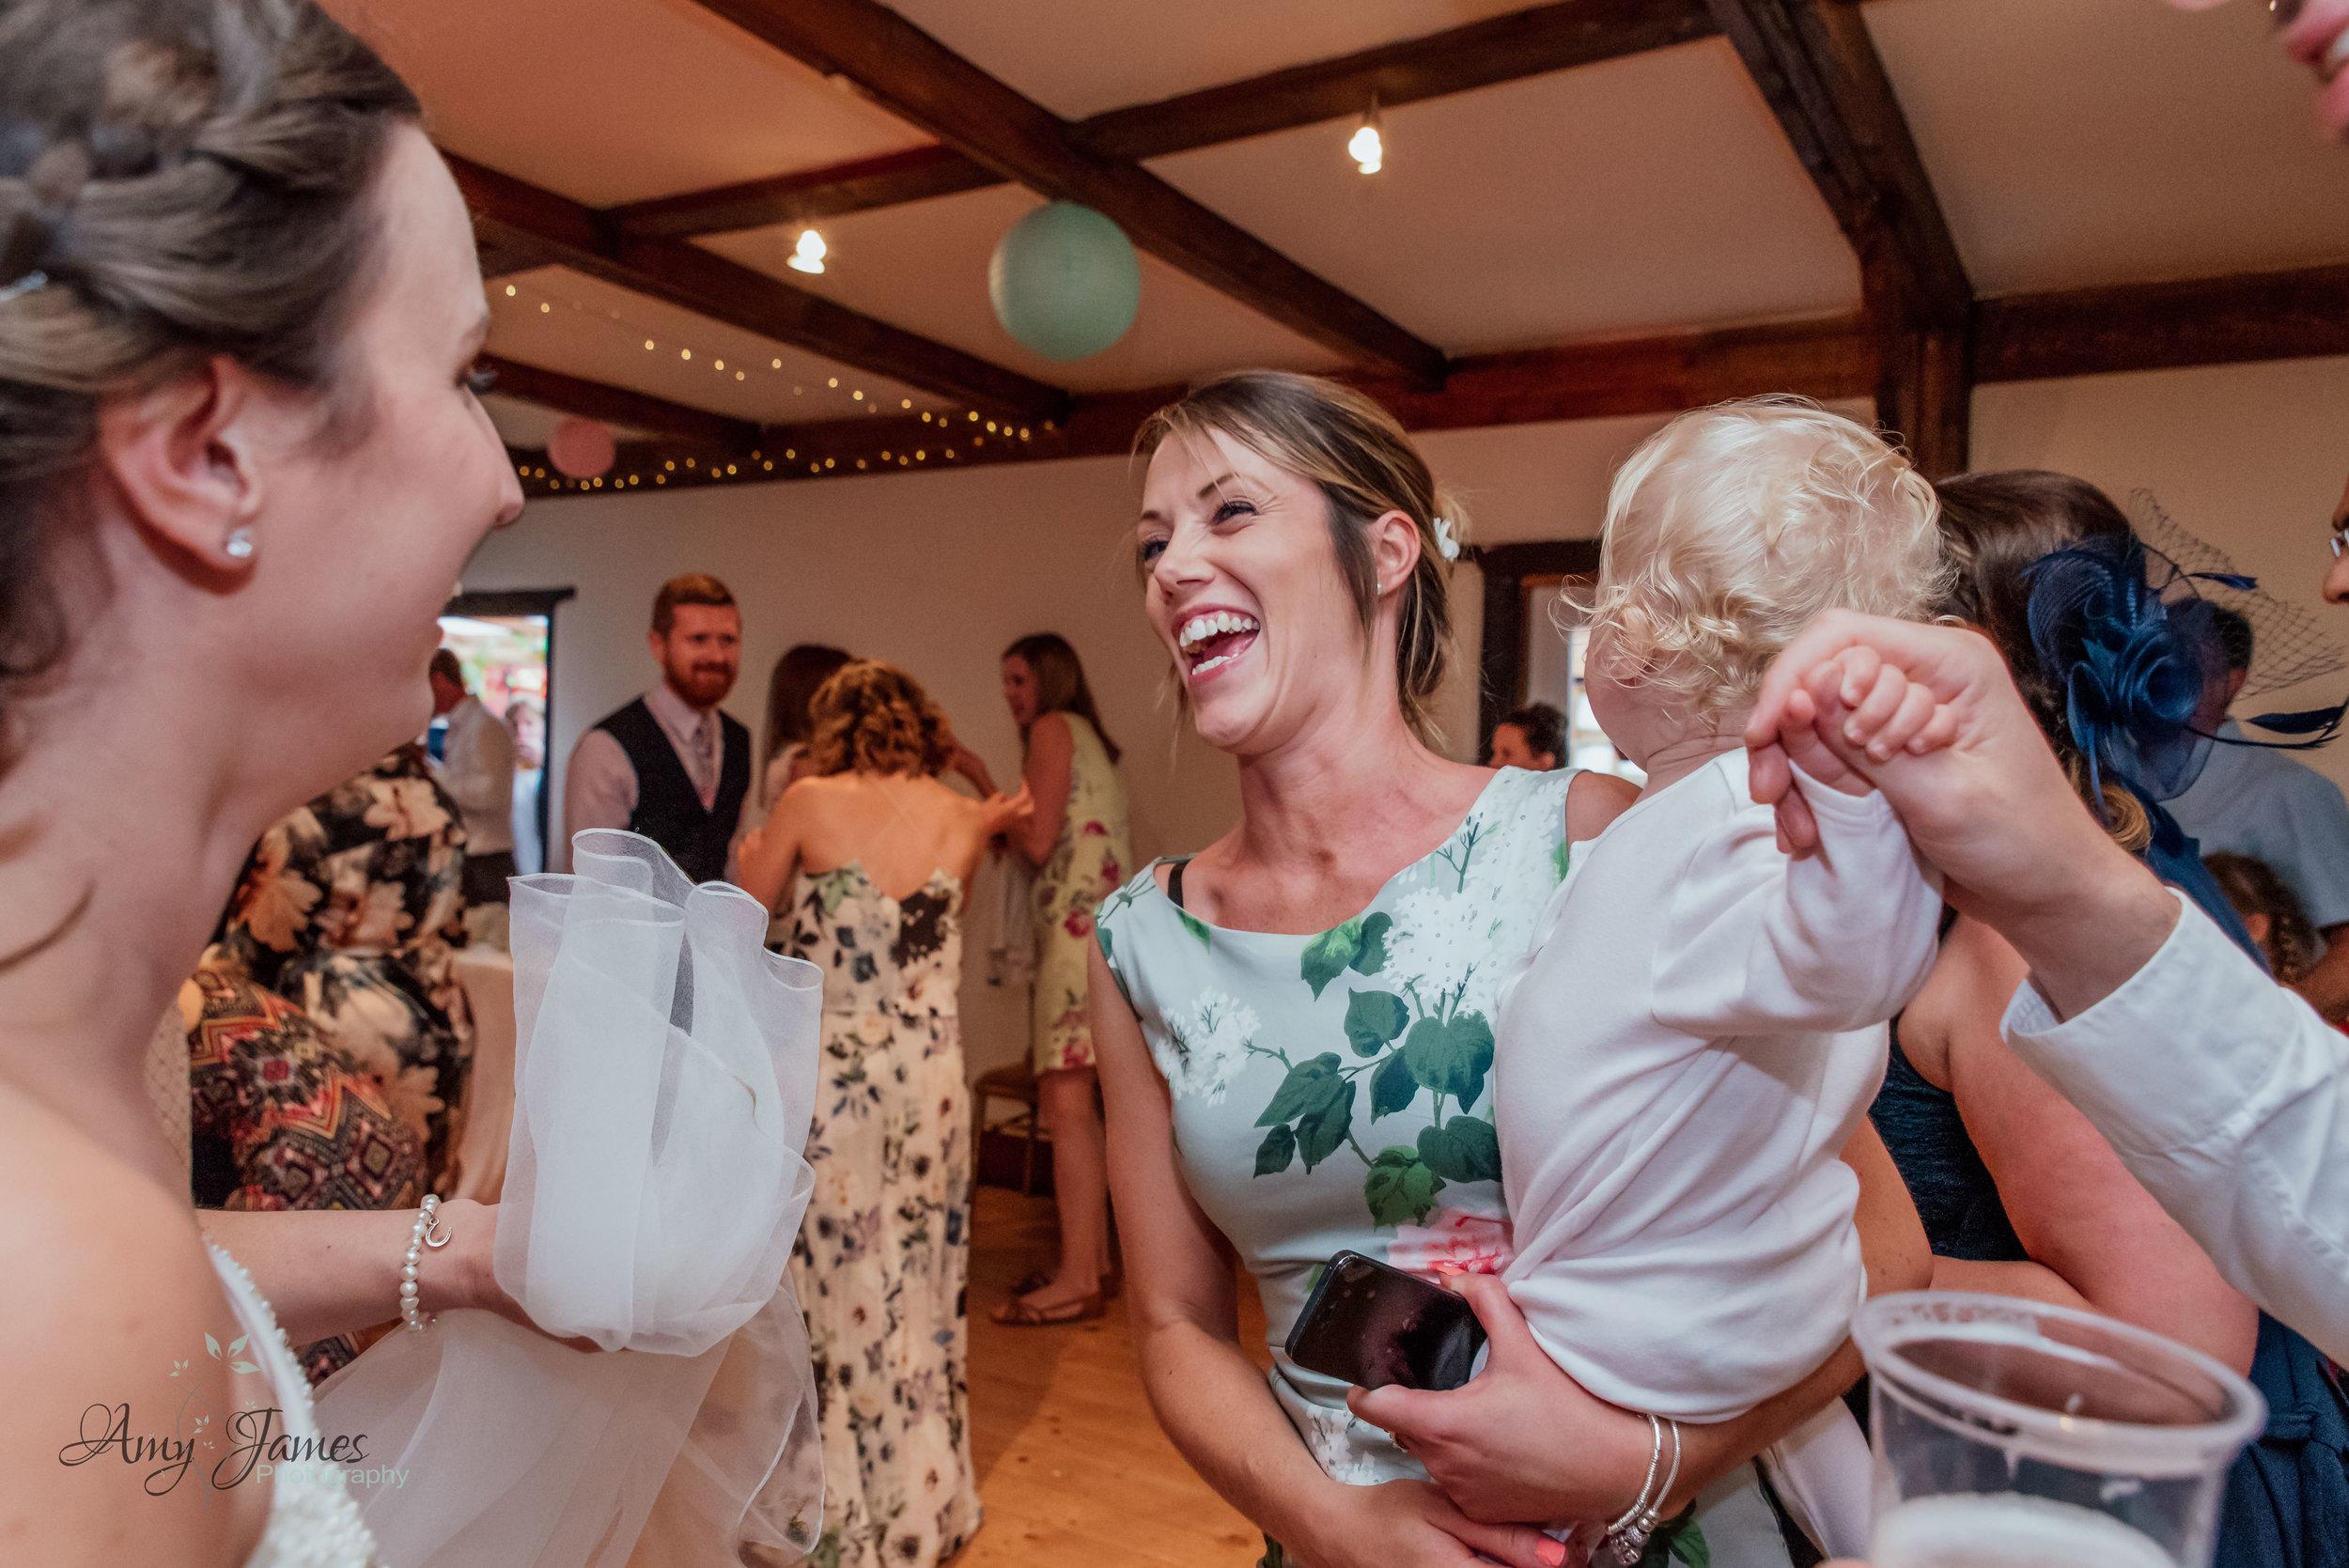 Wedding dancefloor photo by Amy James Photography Hampshire and Surrey documentary wedding photographer